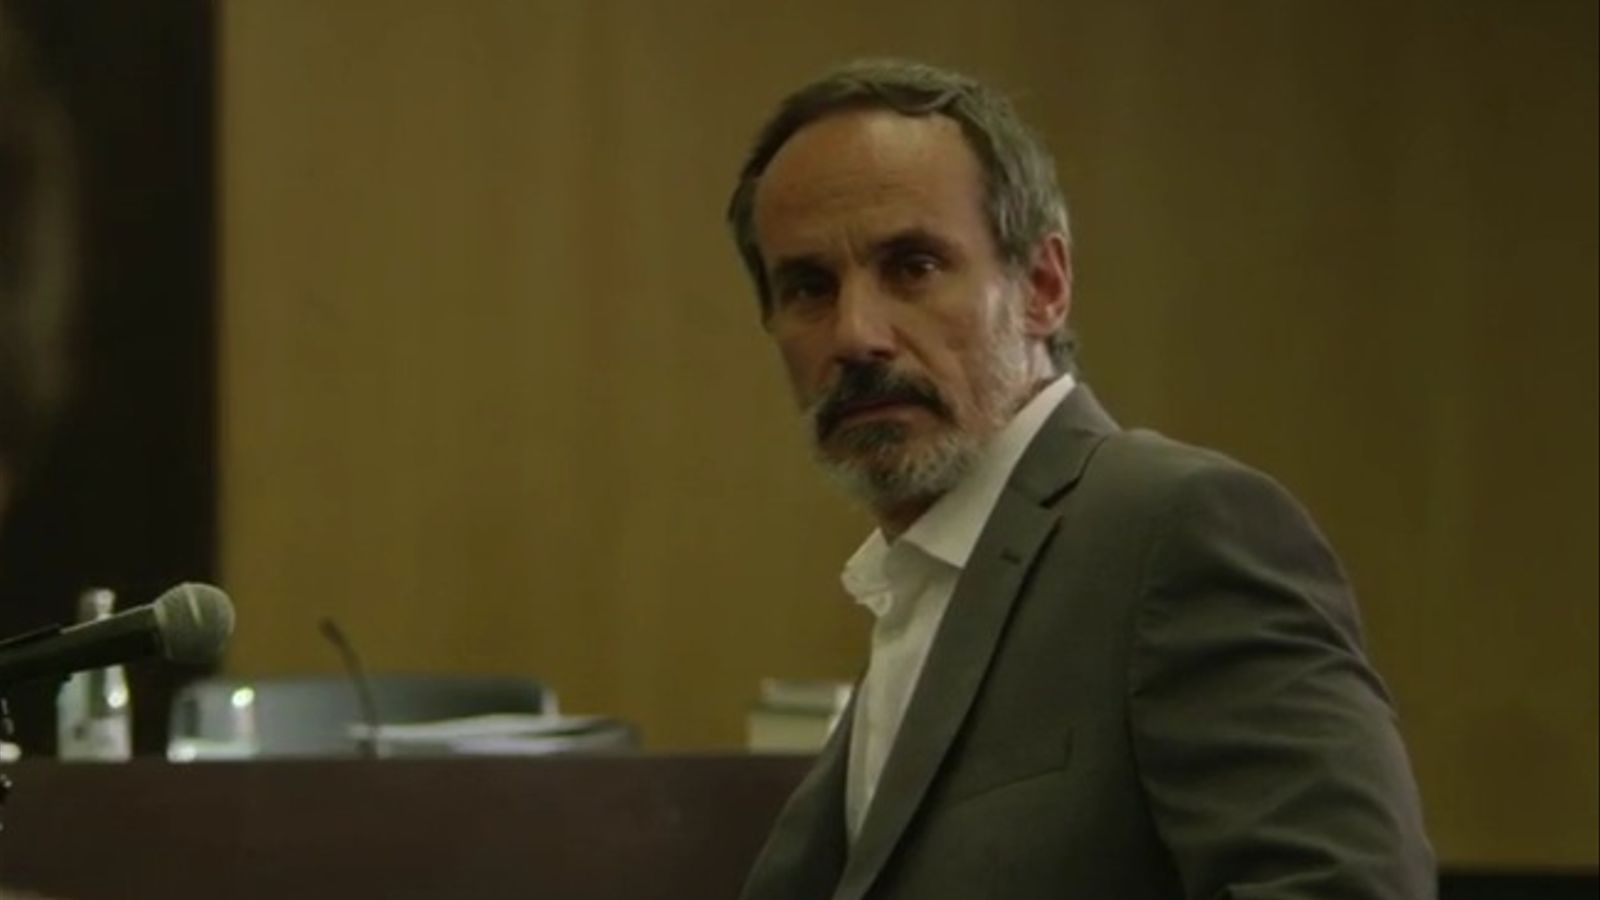 Telecinco estrena 'Sé quién eres', un 'thriller' dirigit per Pau Freixas